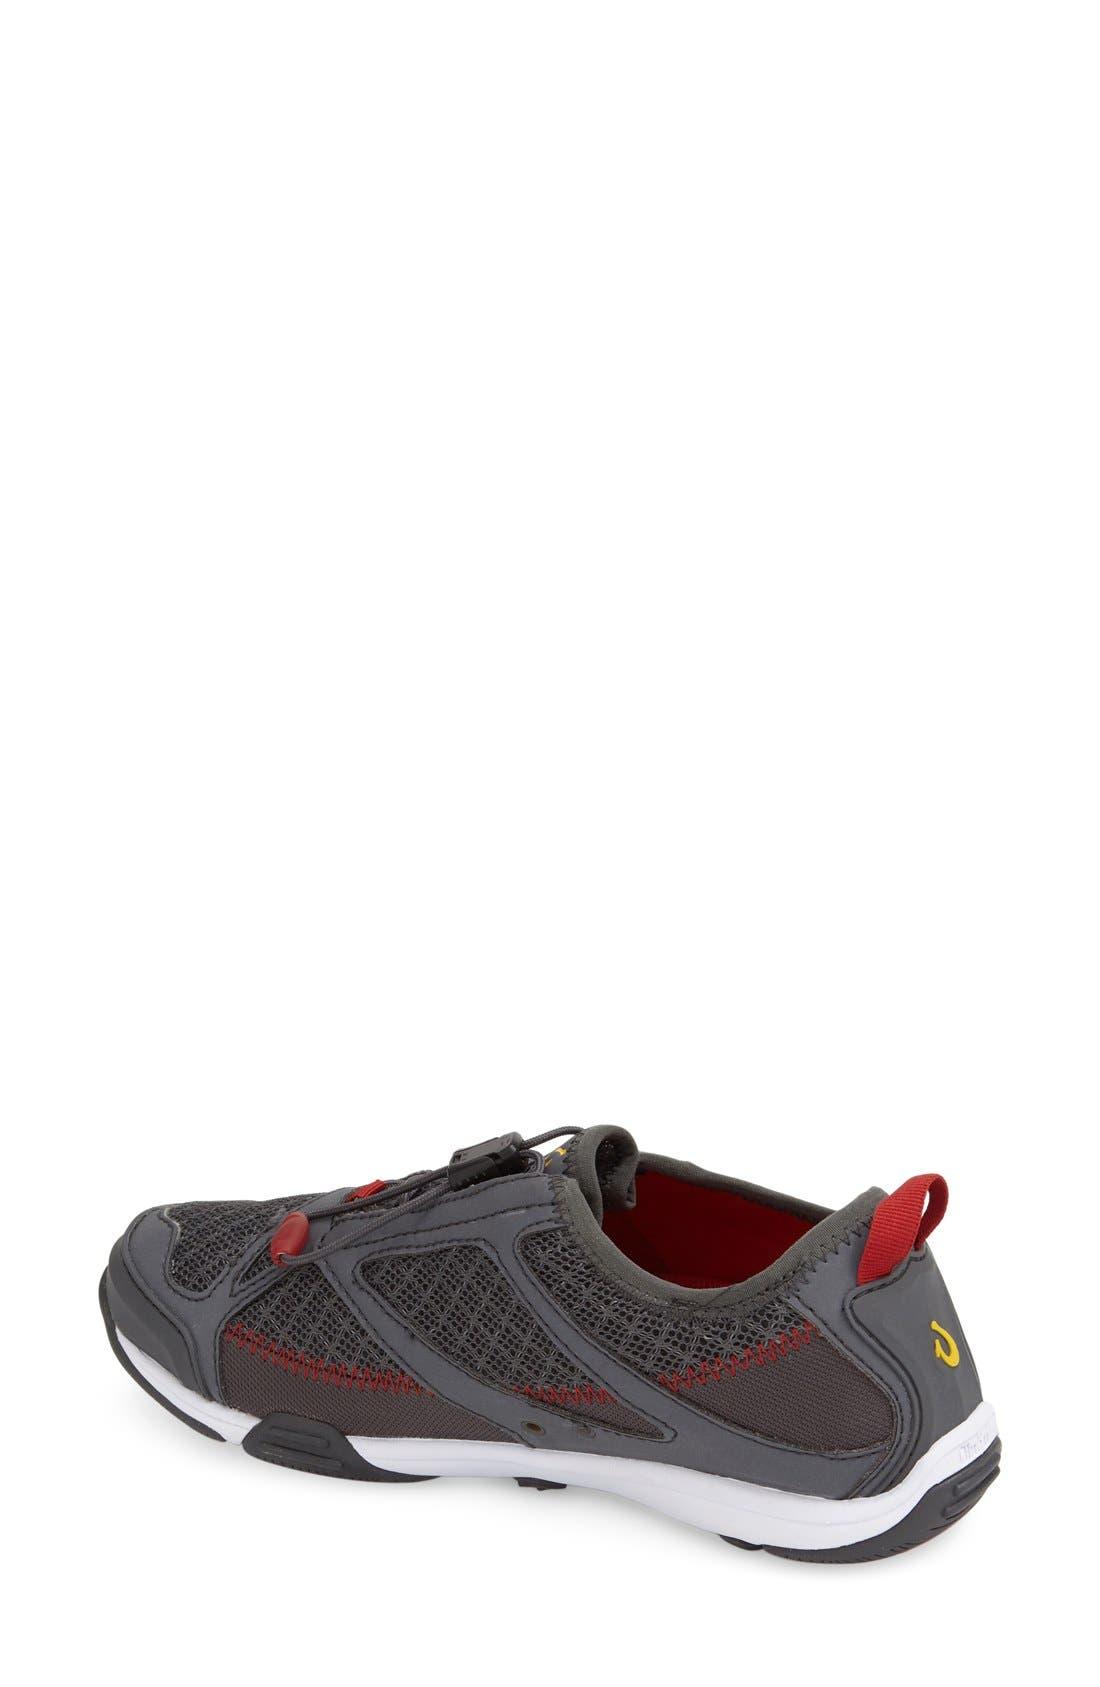 Alternate Image 2  - OluKai 'Eleu' Water-Resistant Sneaker (Women)